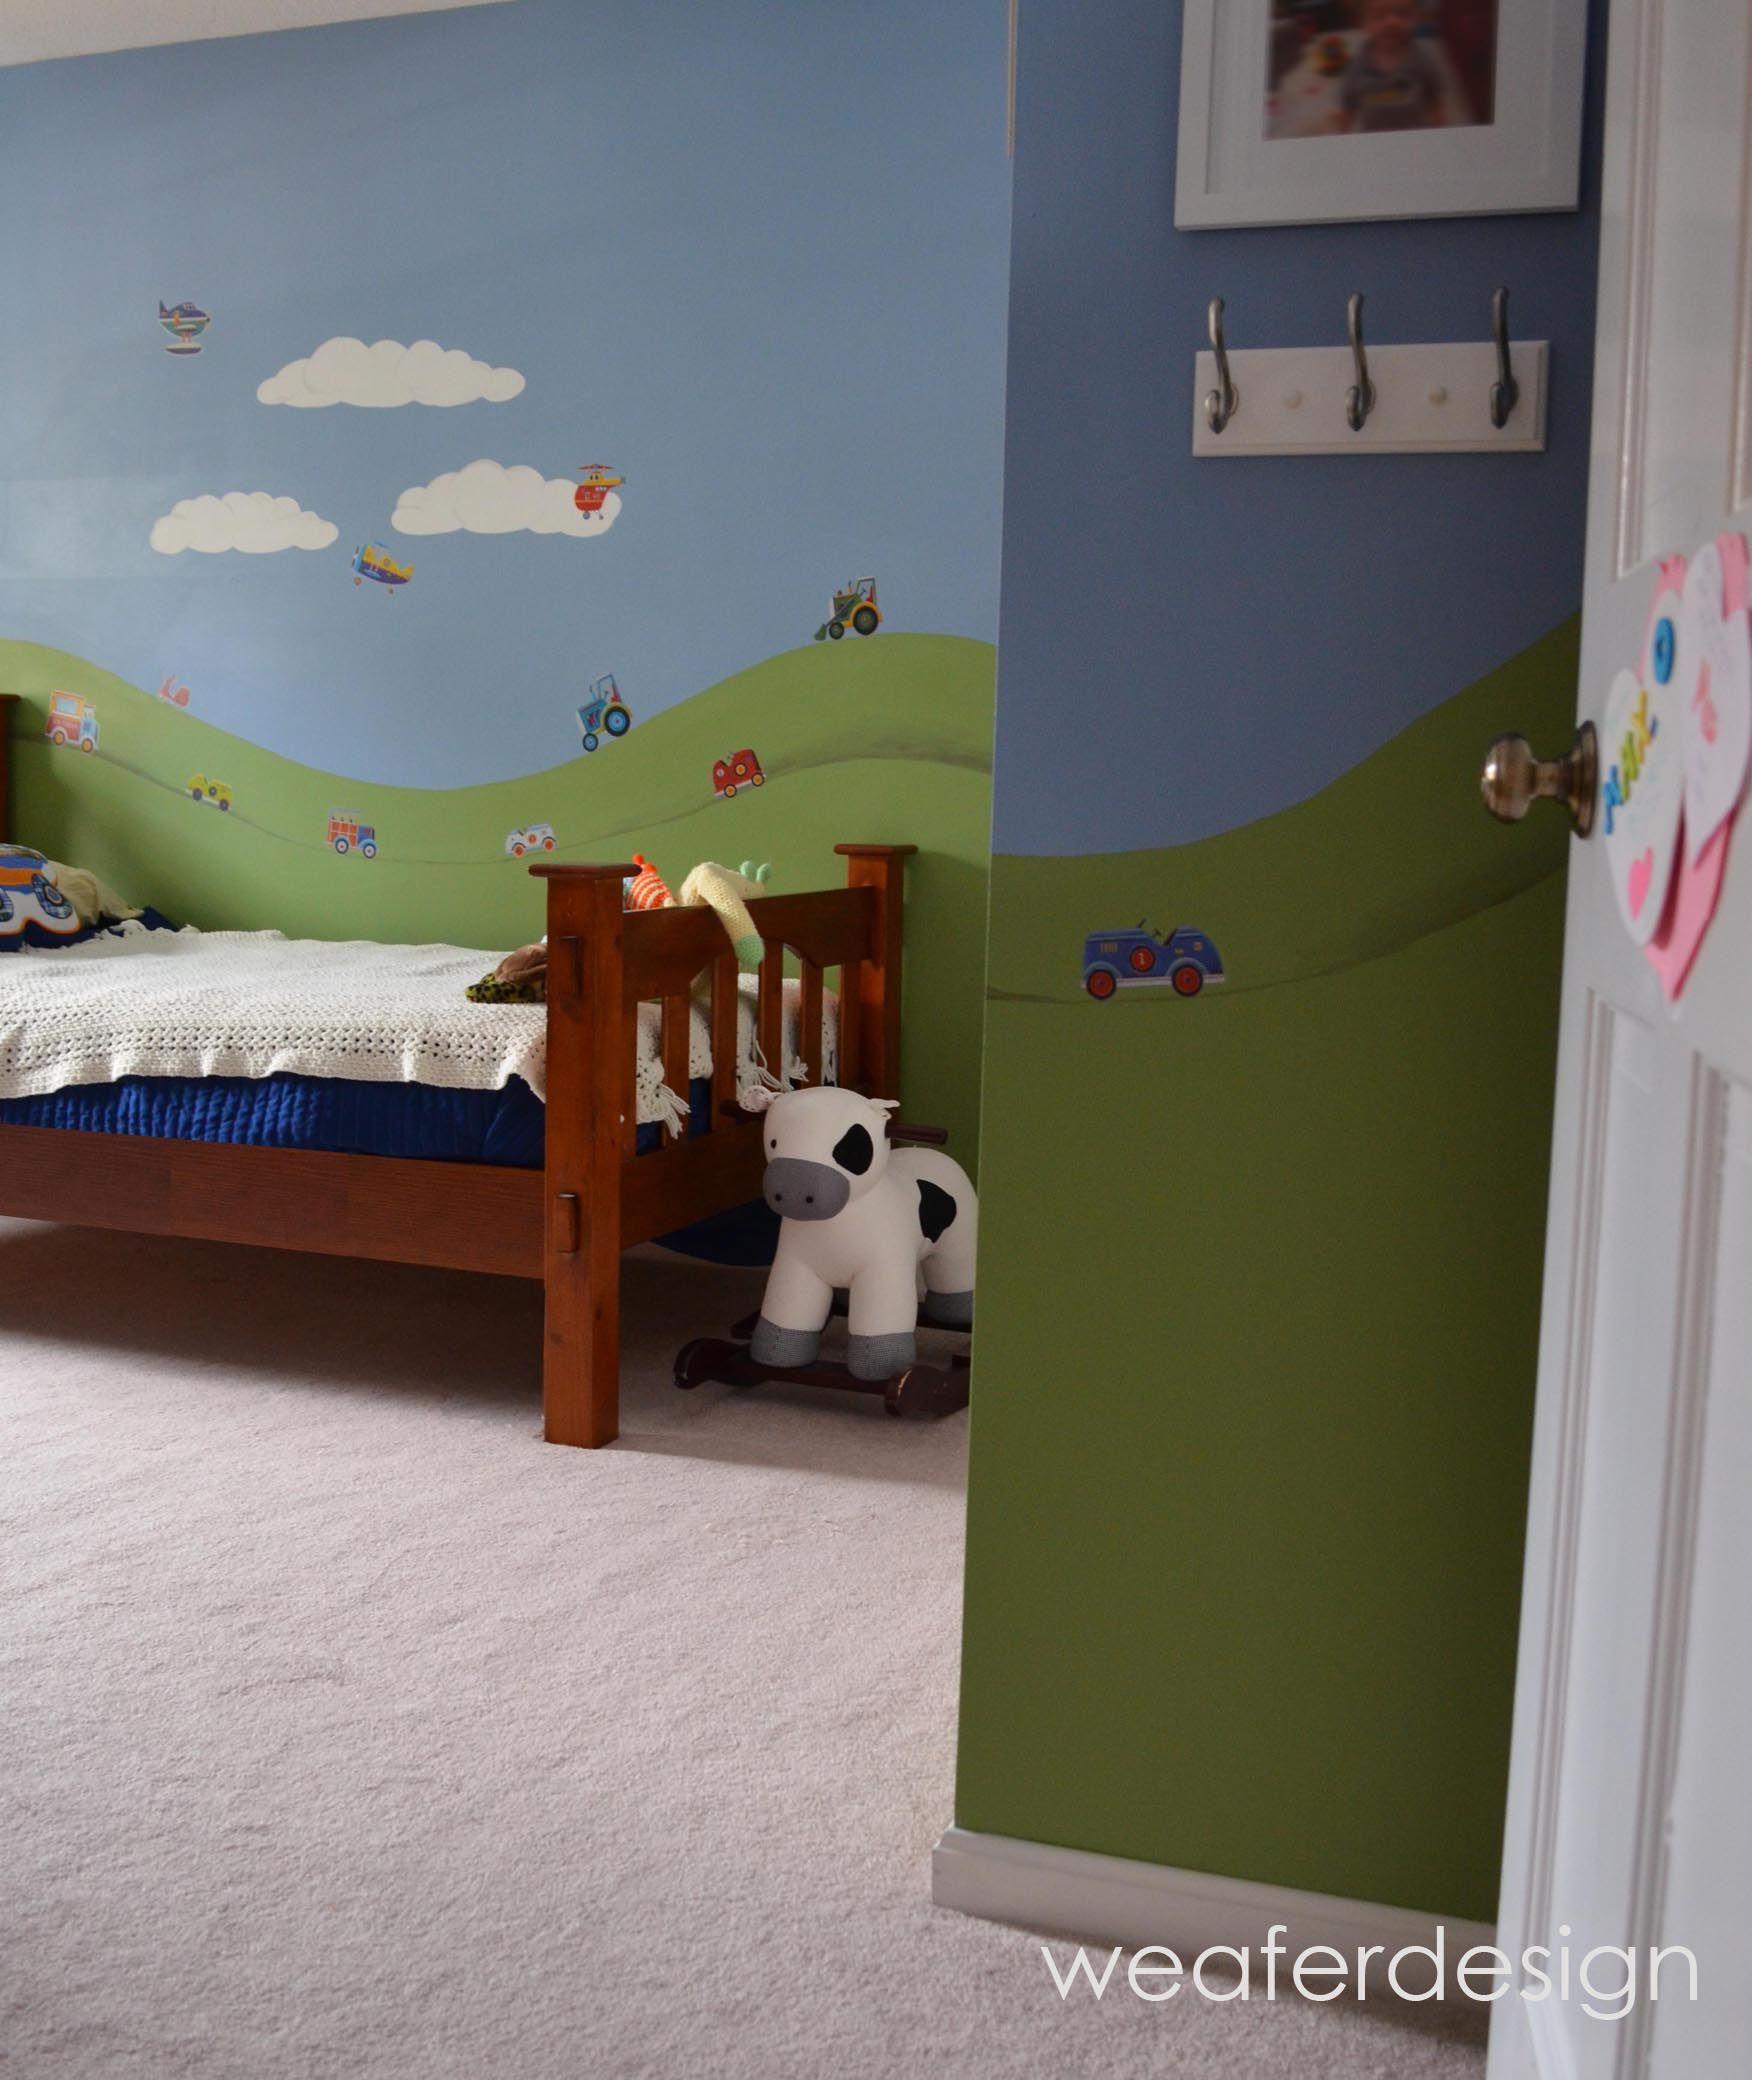 Boys Room, Hills, Sky Hand Painted, Cars